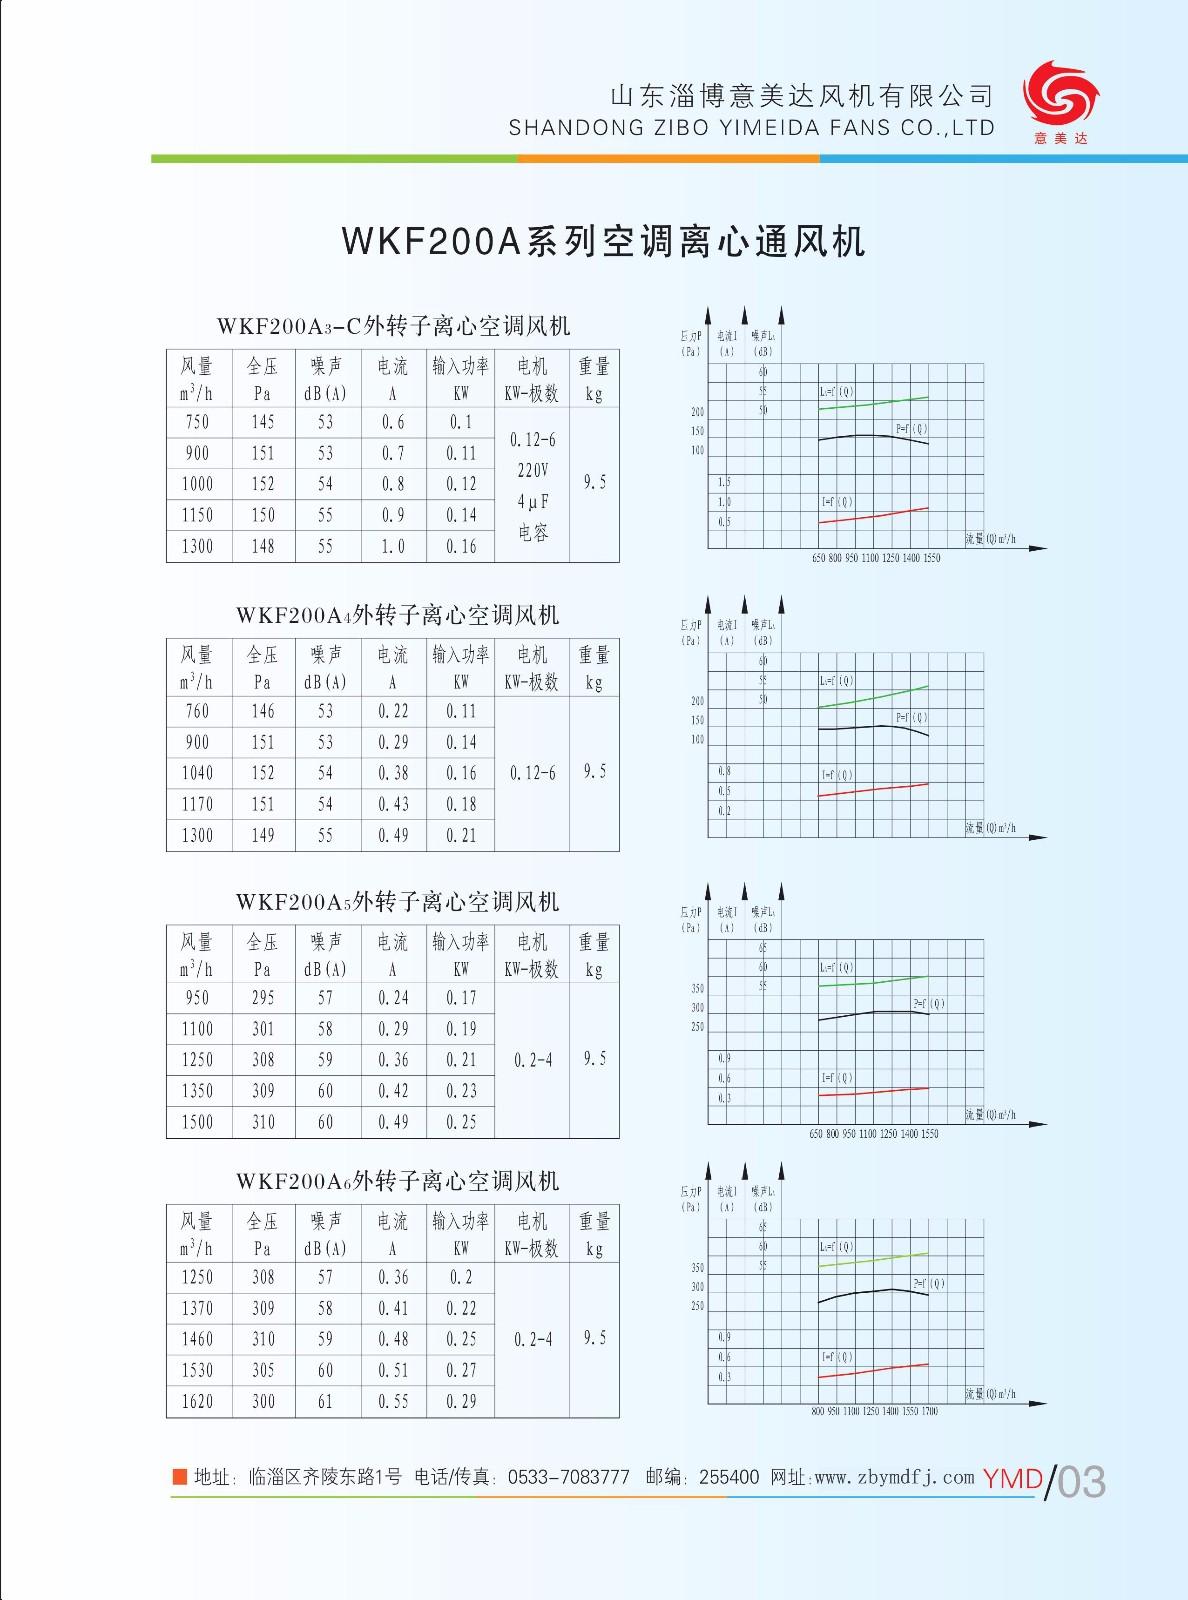 WKF200A6|WKF200A-山东淄博意美达风机有限公司